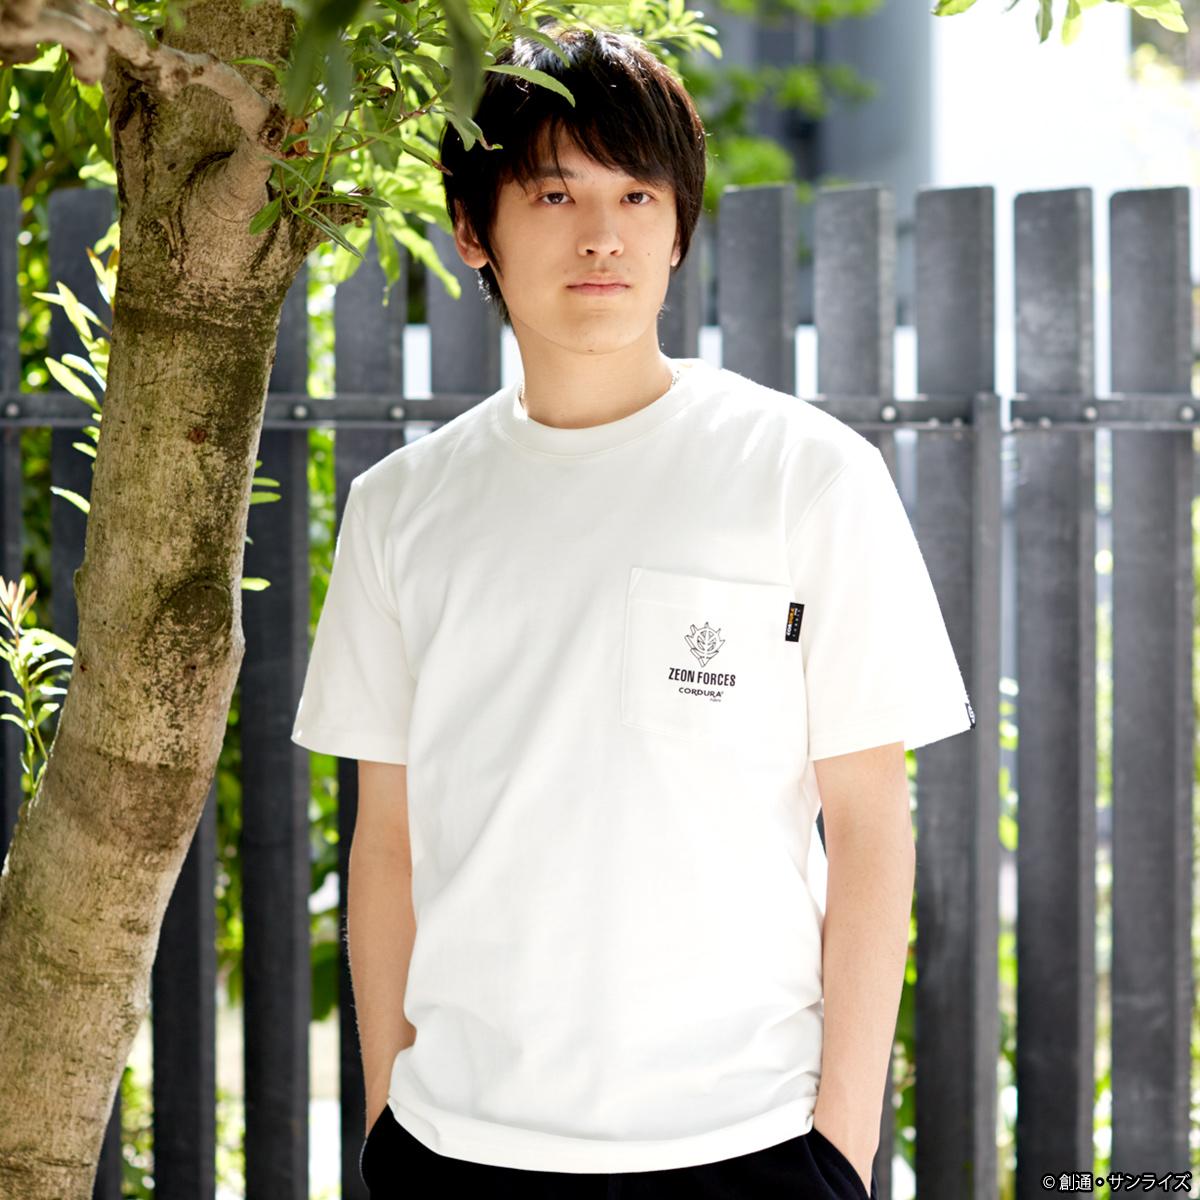 STRICT-G FAB『機動戦士ガンダム』CORDURA  ポケットTシャツ ZEON